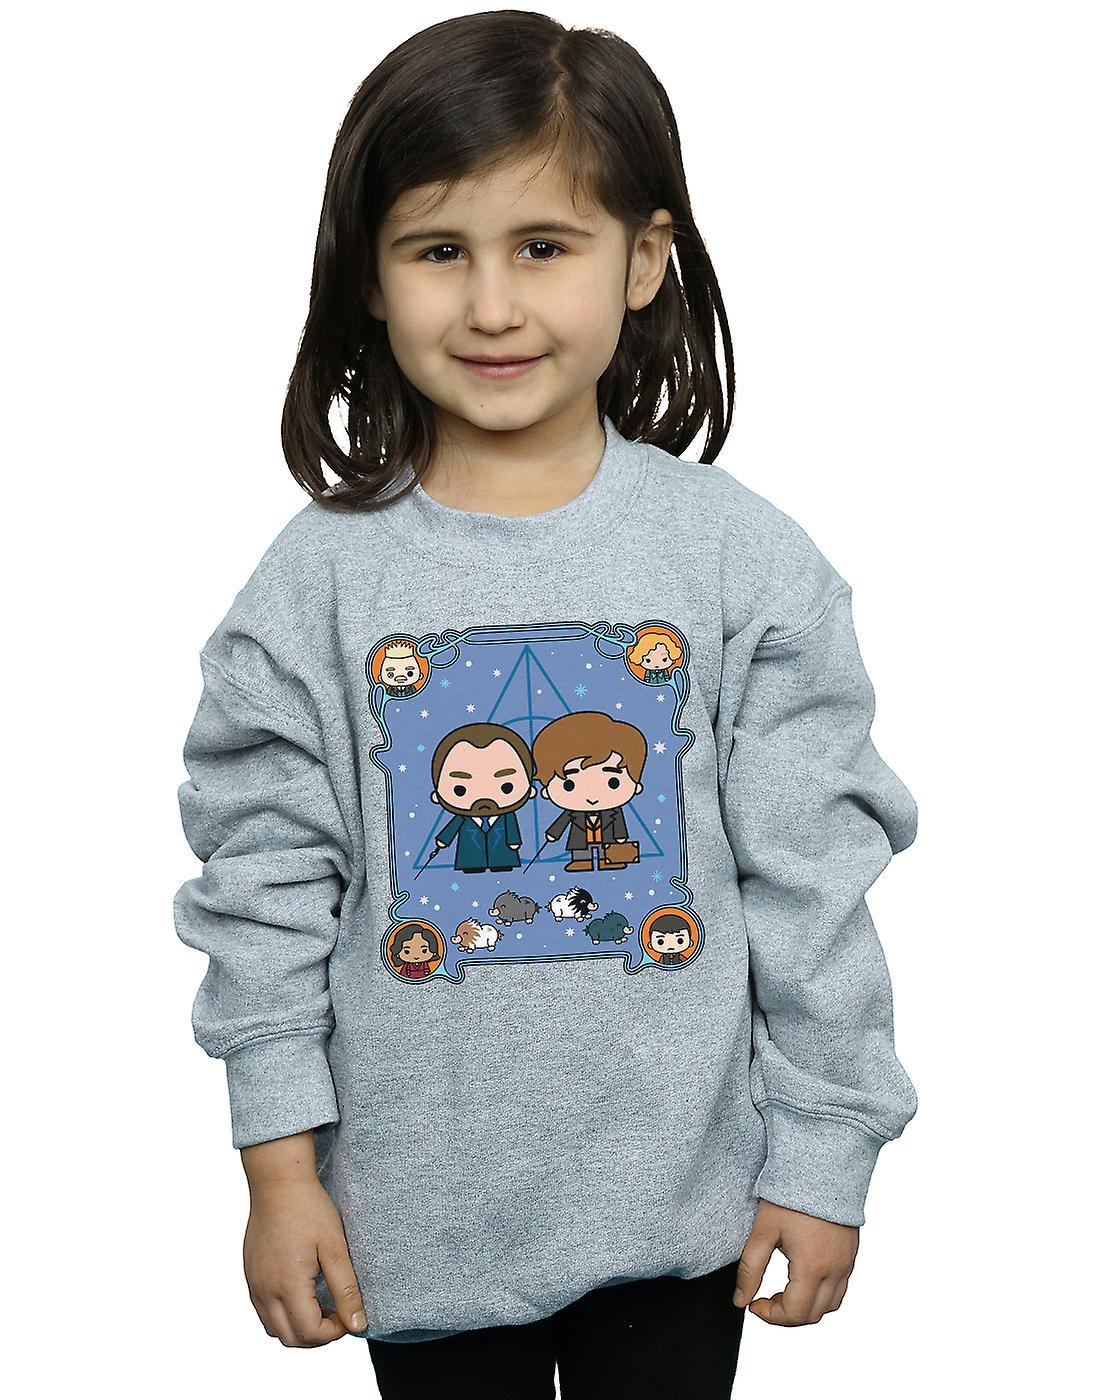 Fantastic Beasts Girls Chibi Newt And Dumbledore Sweatshirt